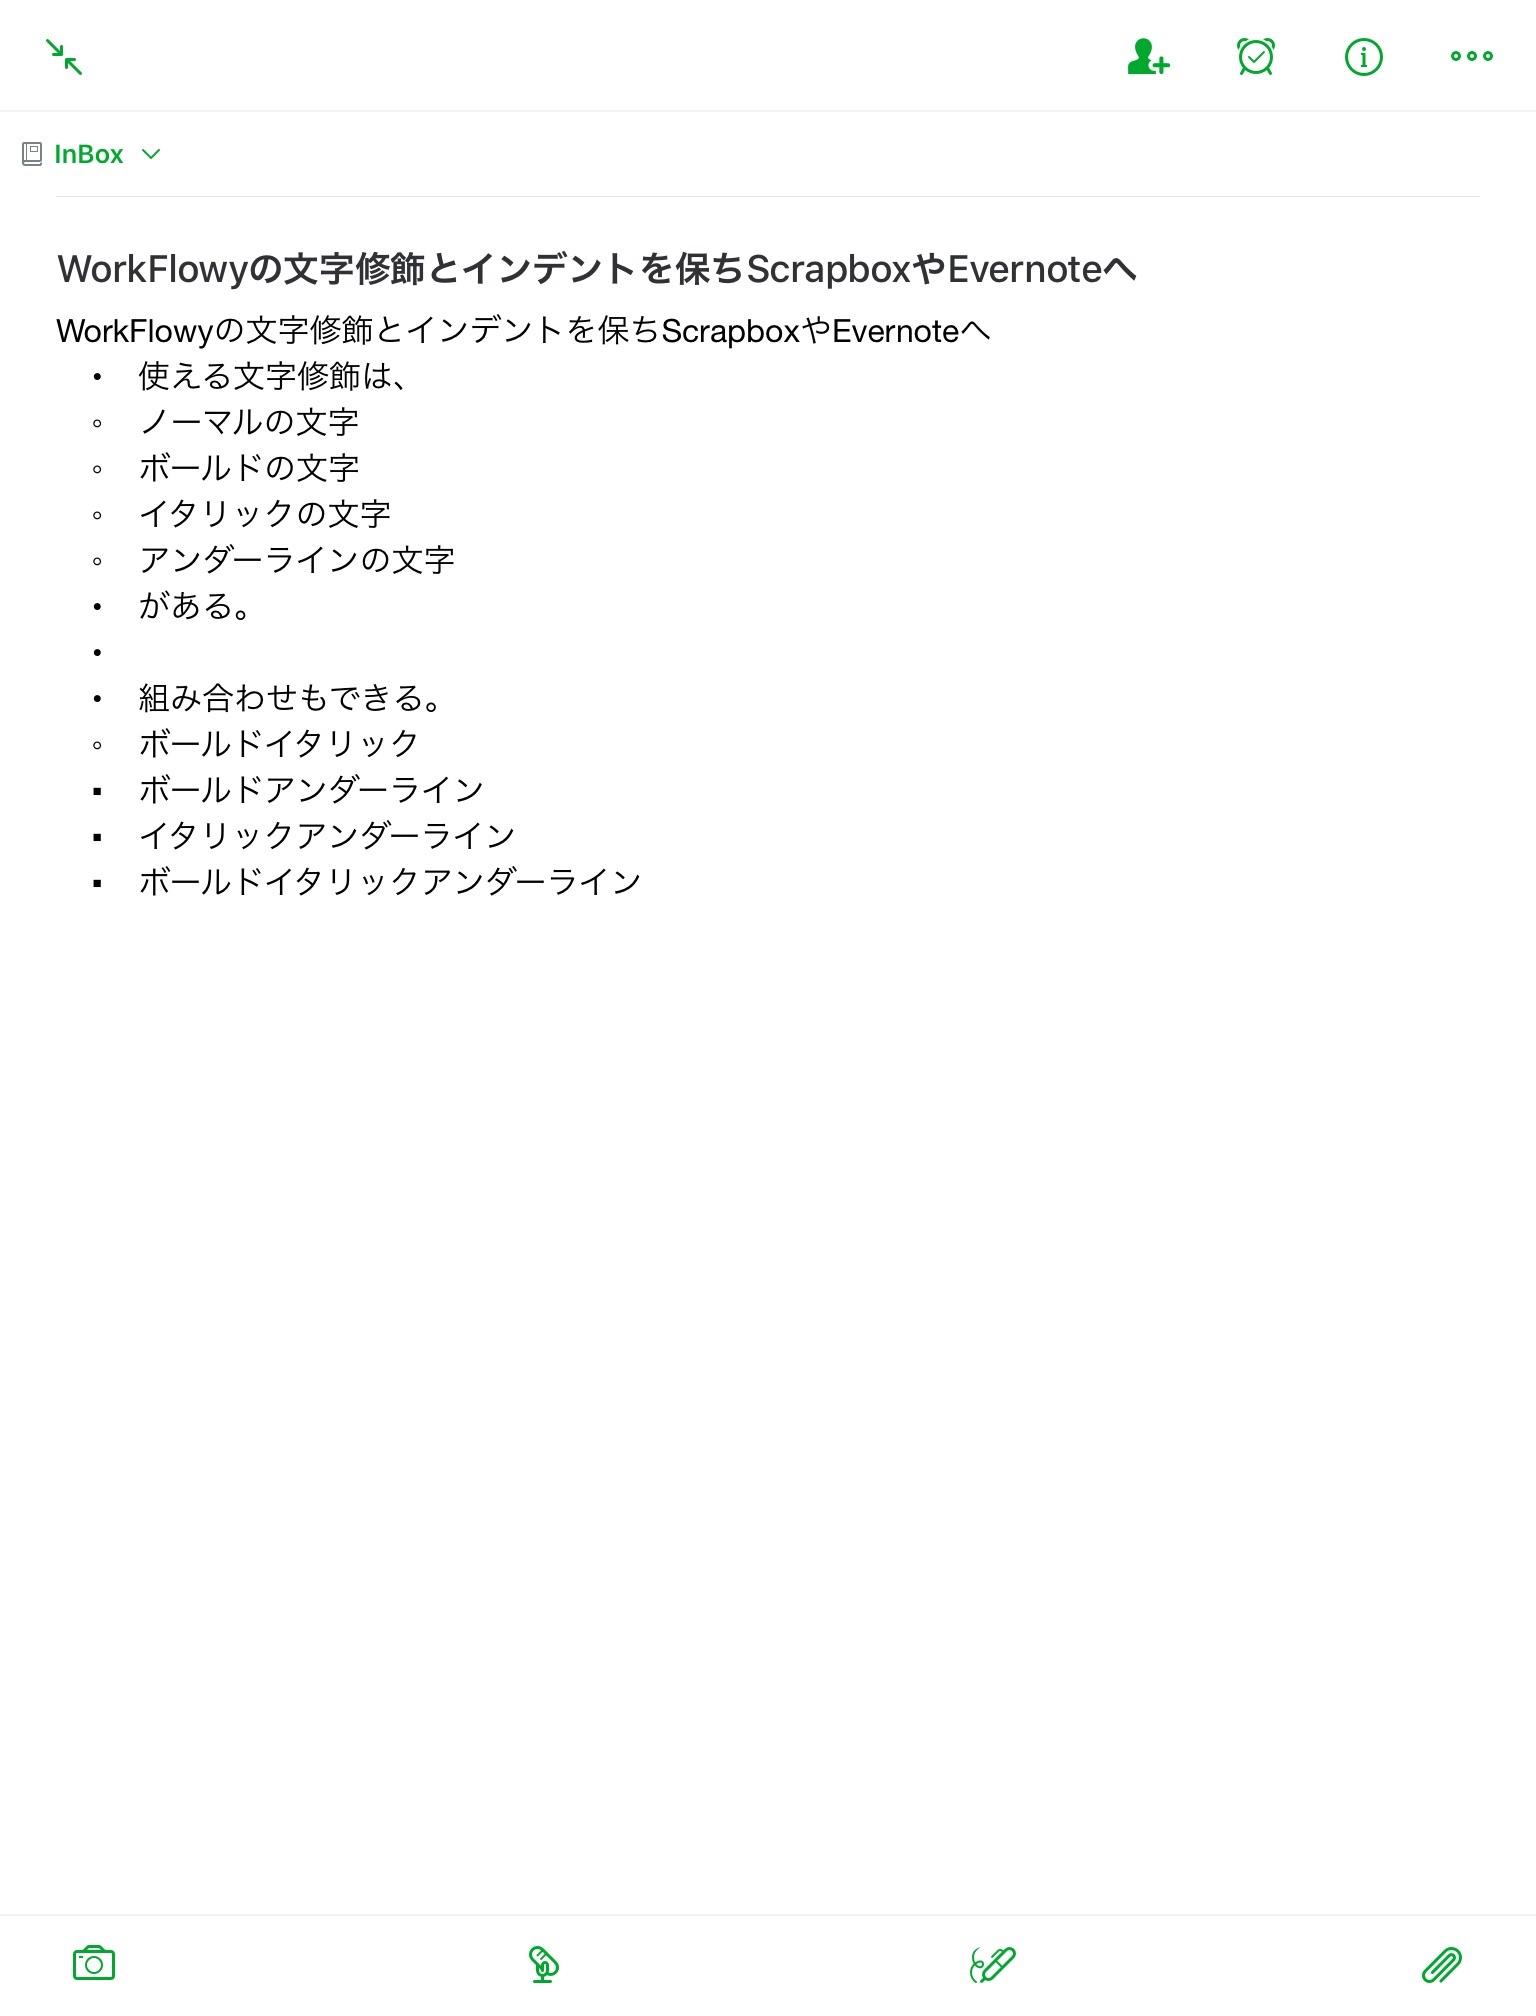 f:id:sorashima:20200731233042j:plain:w637